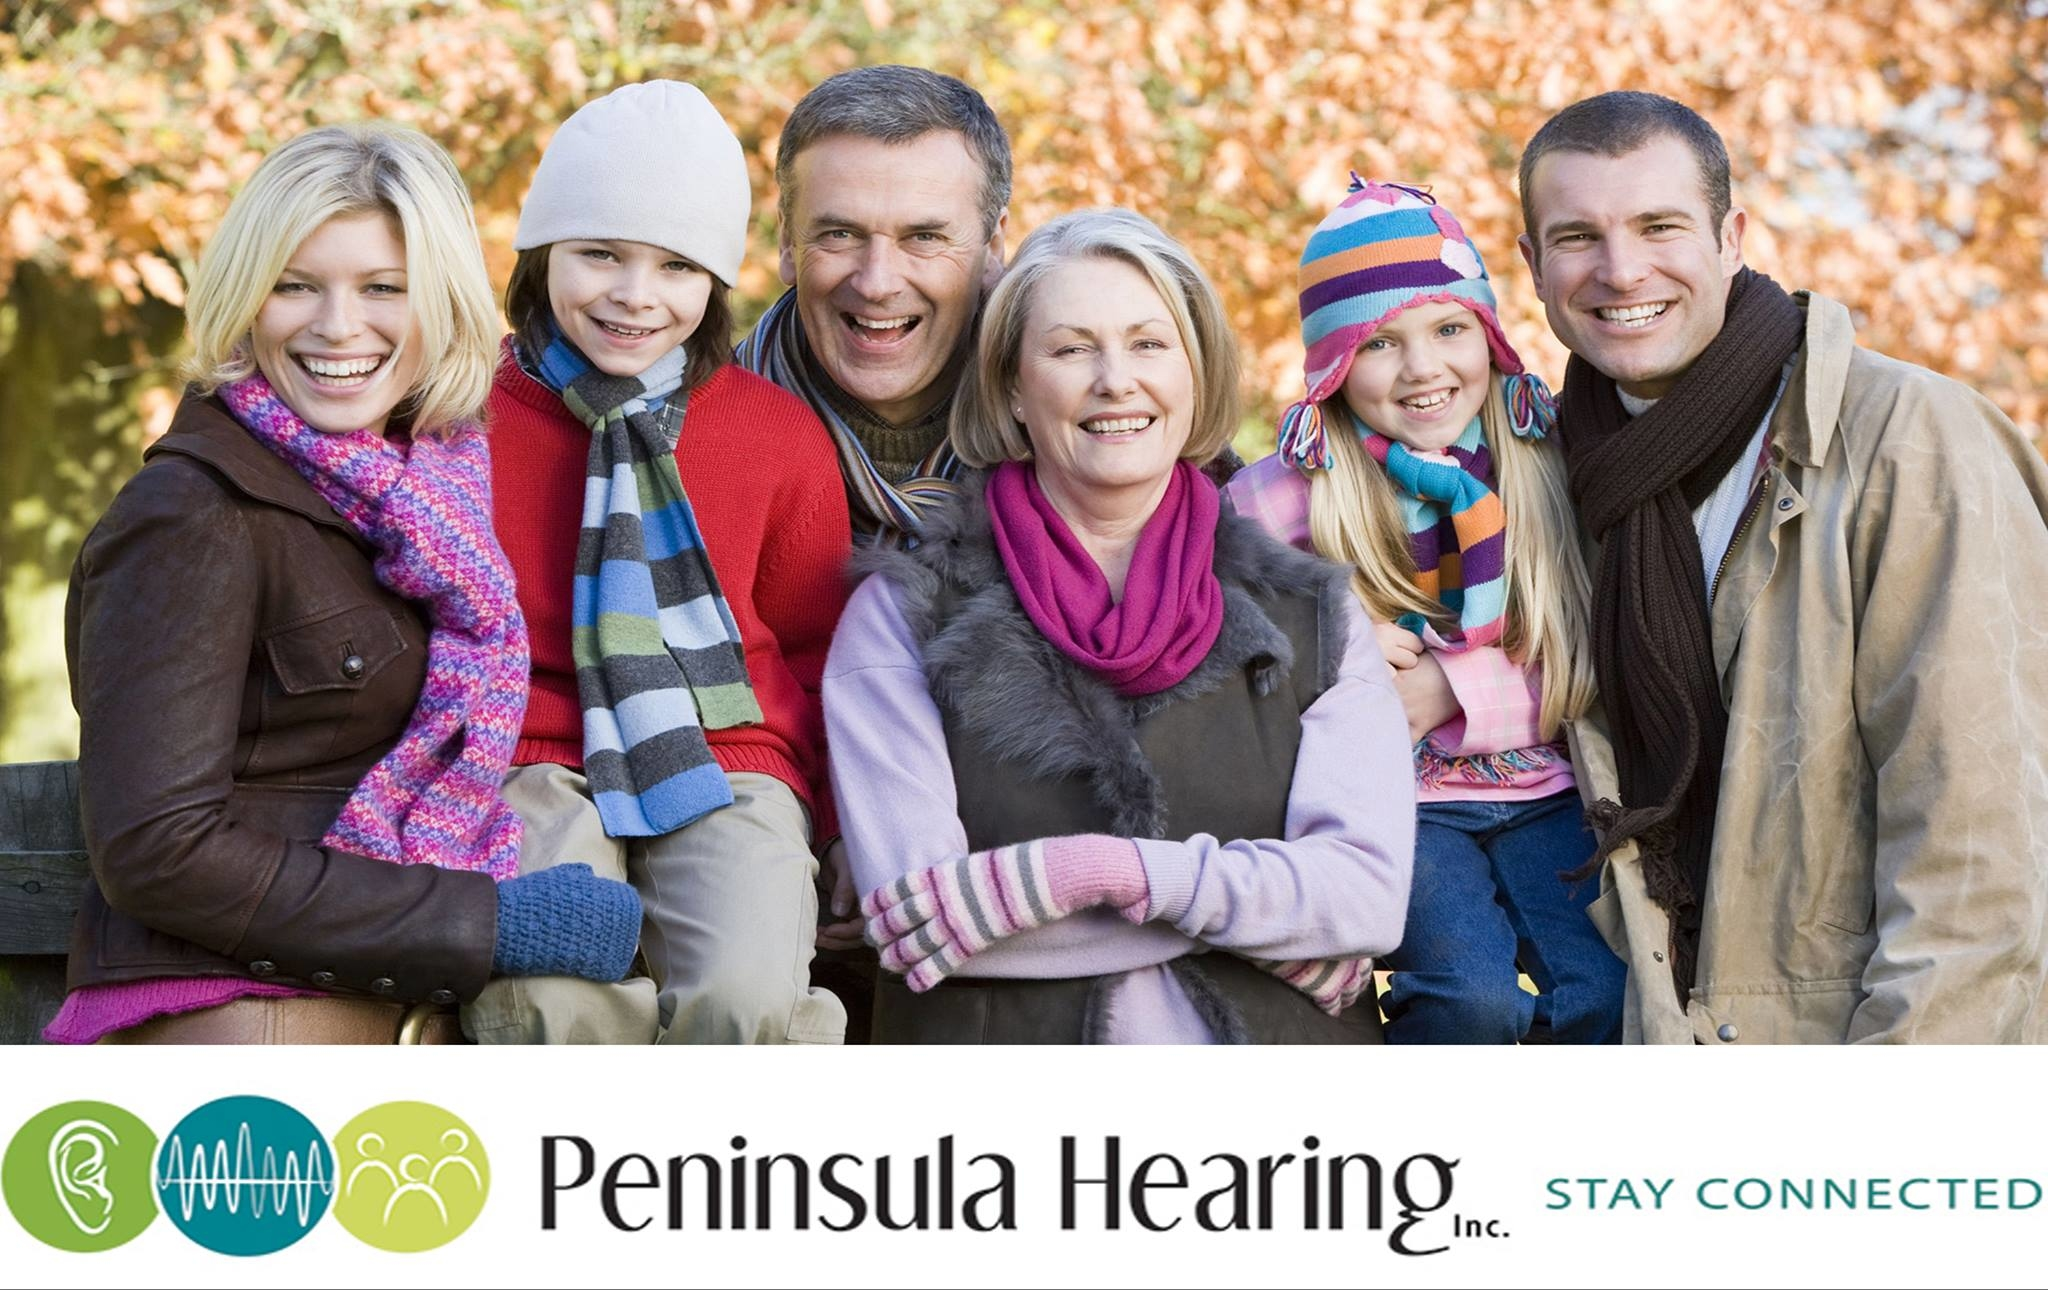 Peninsula Hearing image 1